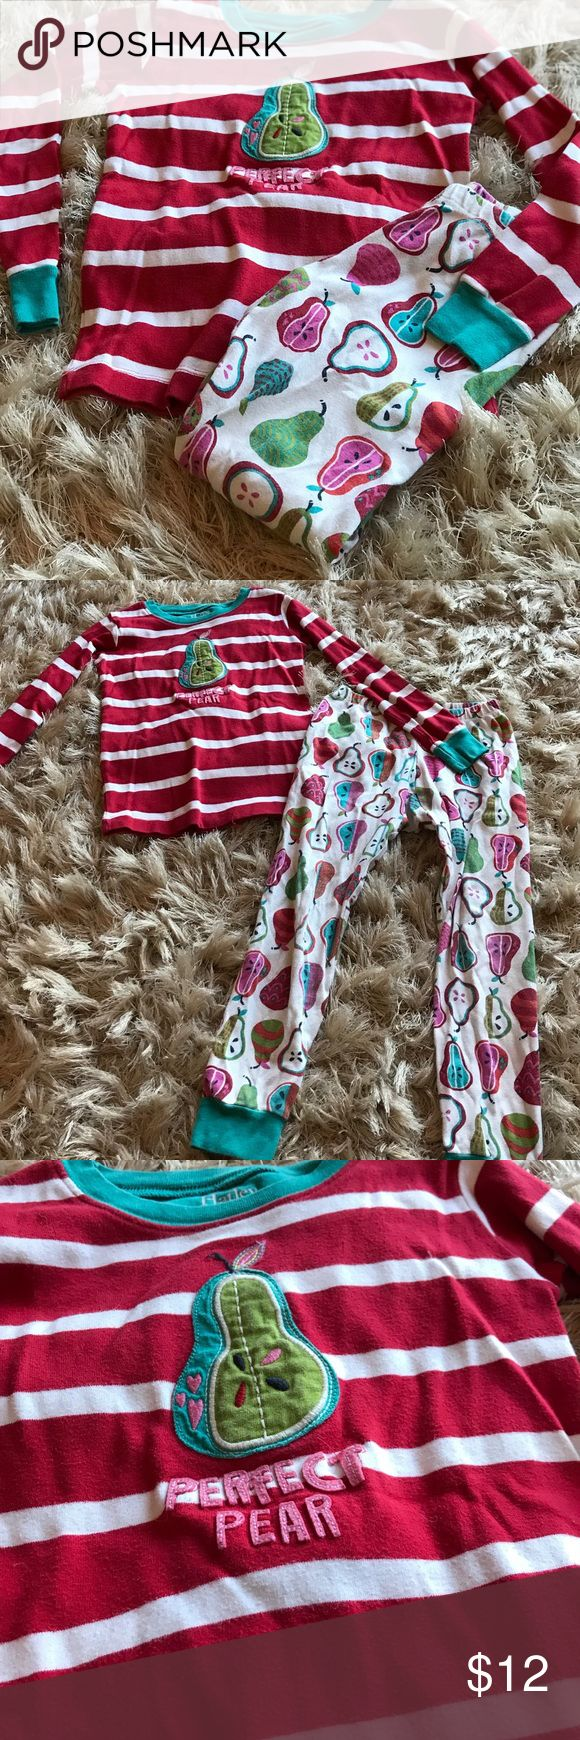 🍐😴Girls Hatley Pajama Set😴🍐 Perfect Pear 🍐girls Hatley pajama set (size 6). Adorable pears adorn the long pants and coordinating long sleeve top. Good used condition; slight fading from washing. Hatley Pajamas Pajama Sets